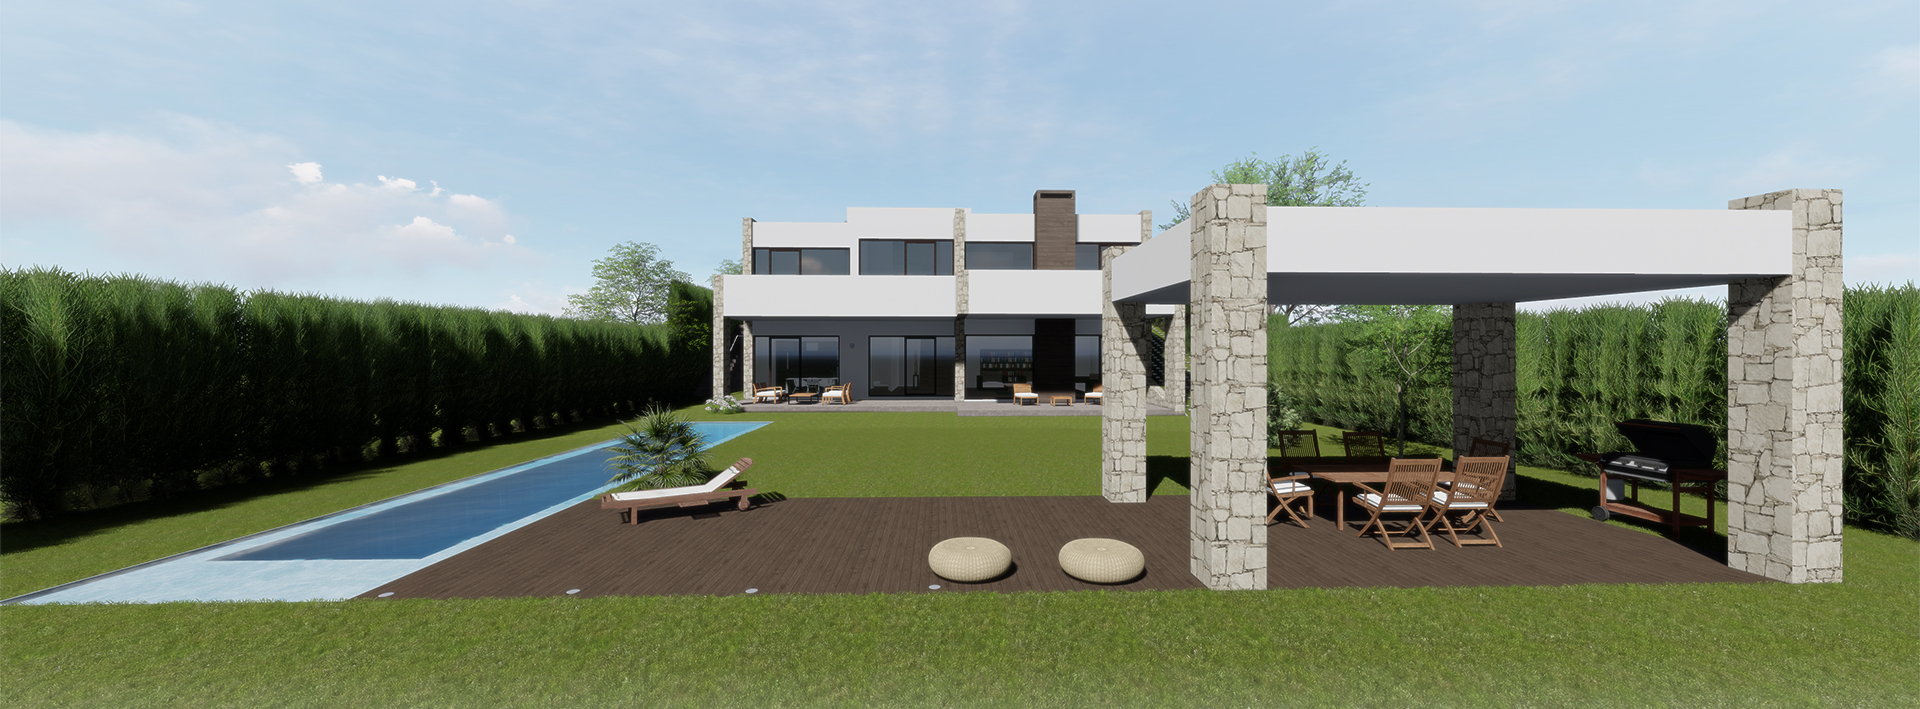 House in sotogrande pureza rv arquitectos - Arquitecto sotogrande ...